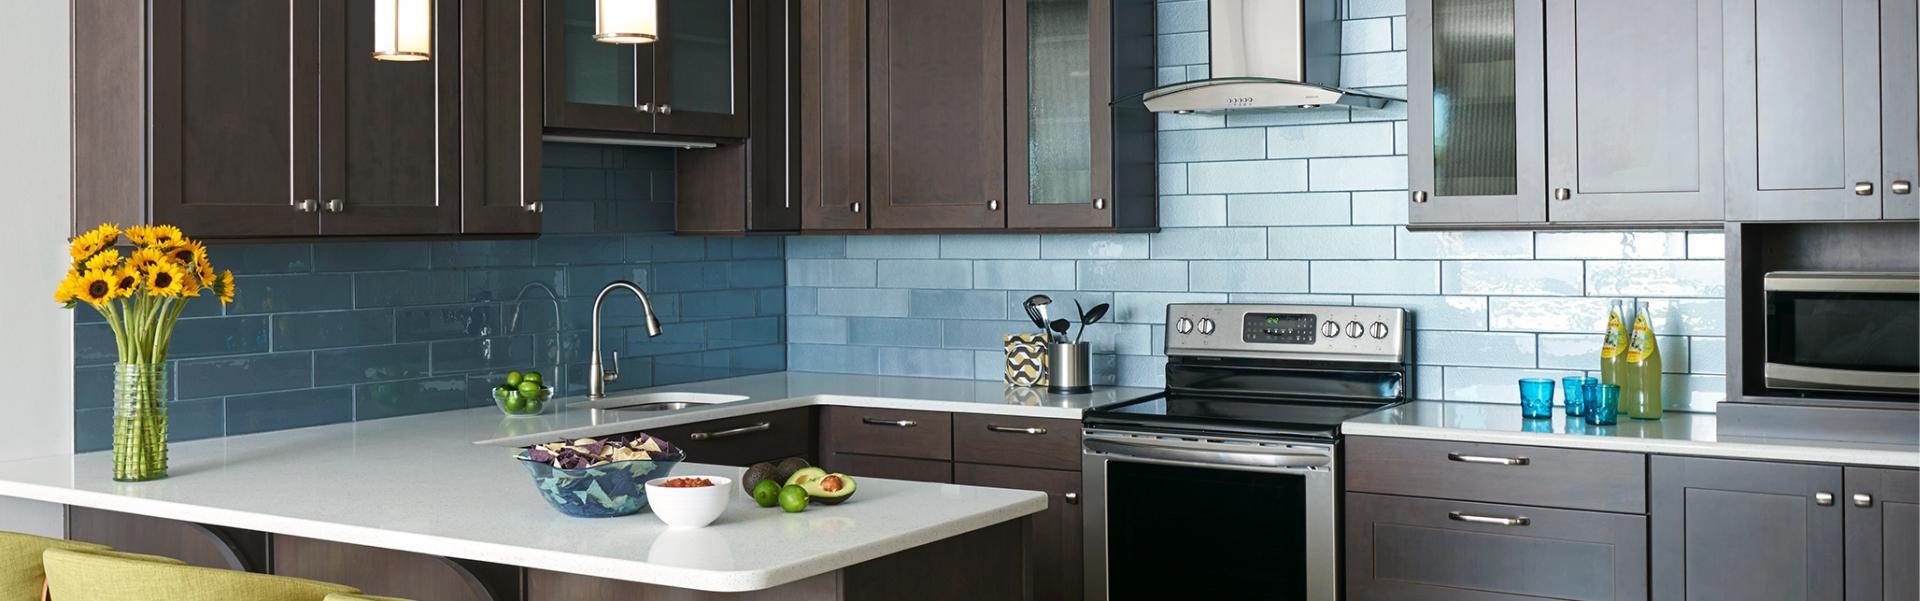 Summerfield kitchen by Marsh Cabinets